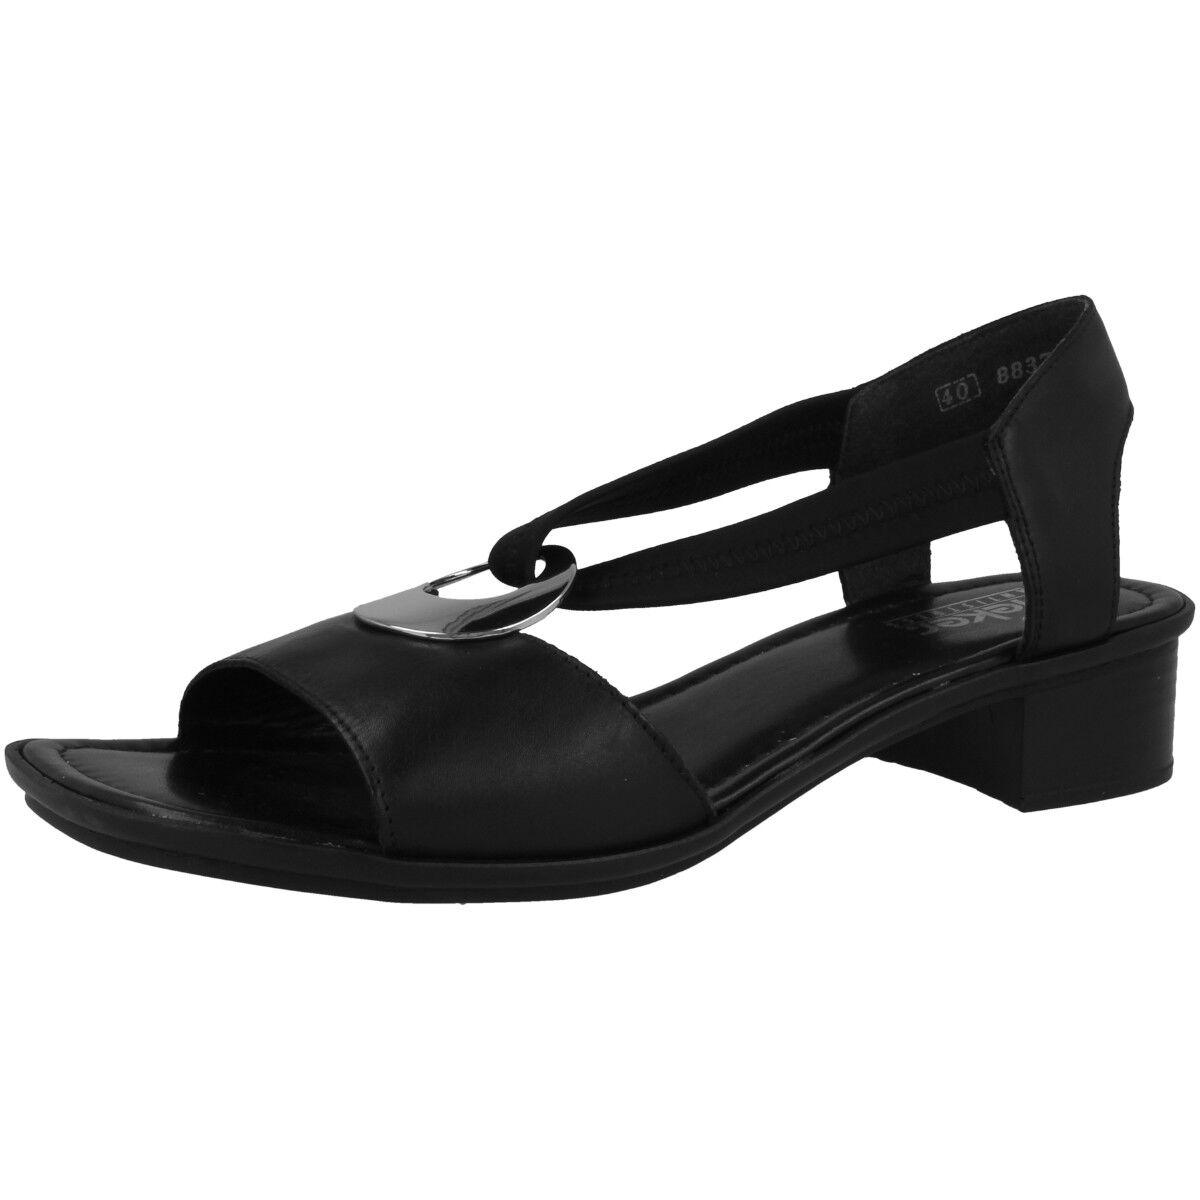 Rieker Aroma-Stretch Schuhe Damen Sandalette Sandalen Pantoletten schwarz 62662-01